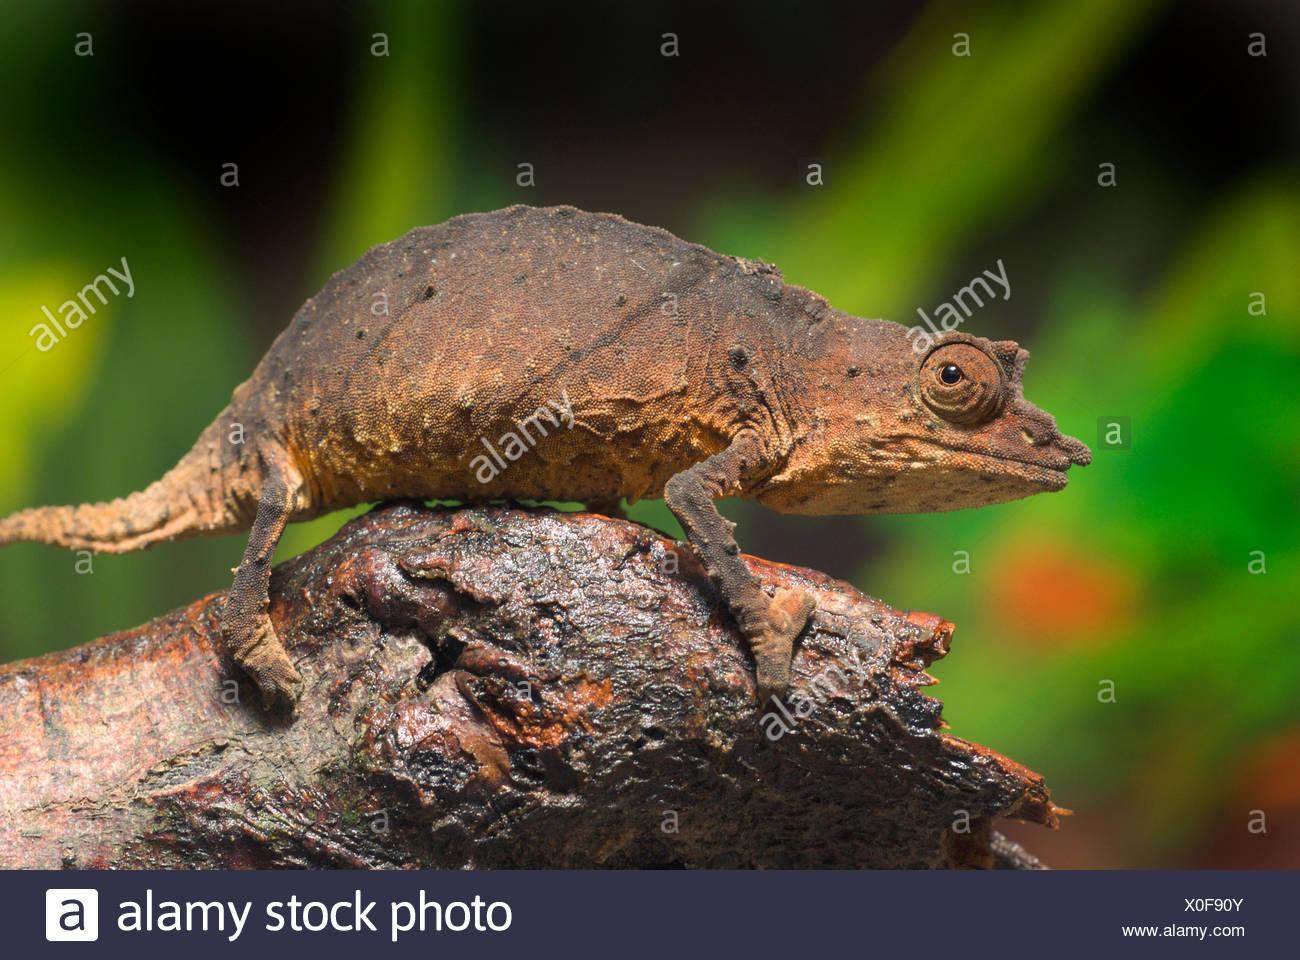 Leaf chameleon, Cameroon stumptail chameleon, Spectral Pygmy Chameleon (Rhampholeon spectrum), on a branch - Stock Image